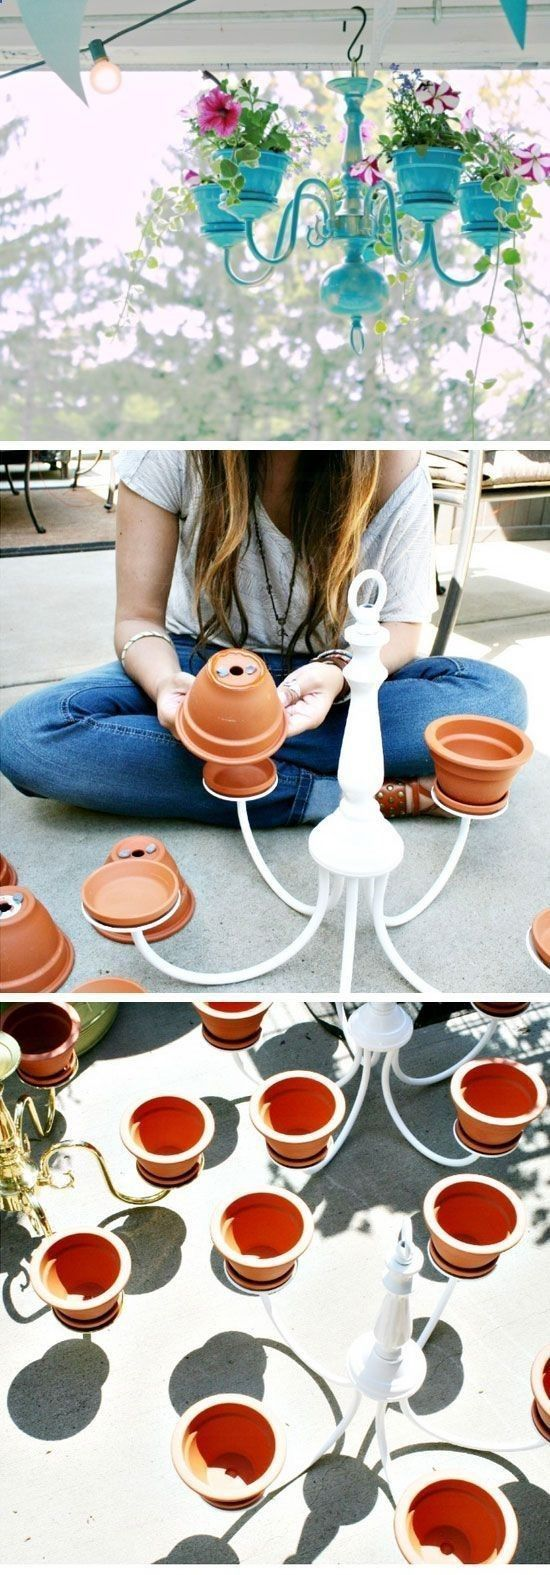 Chandelier Planter Tutorial   DIY Garden Projects Ideas Backyards   DIY Garden Decoartions Budget Backyard by ollie